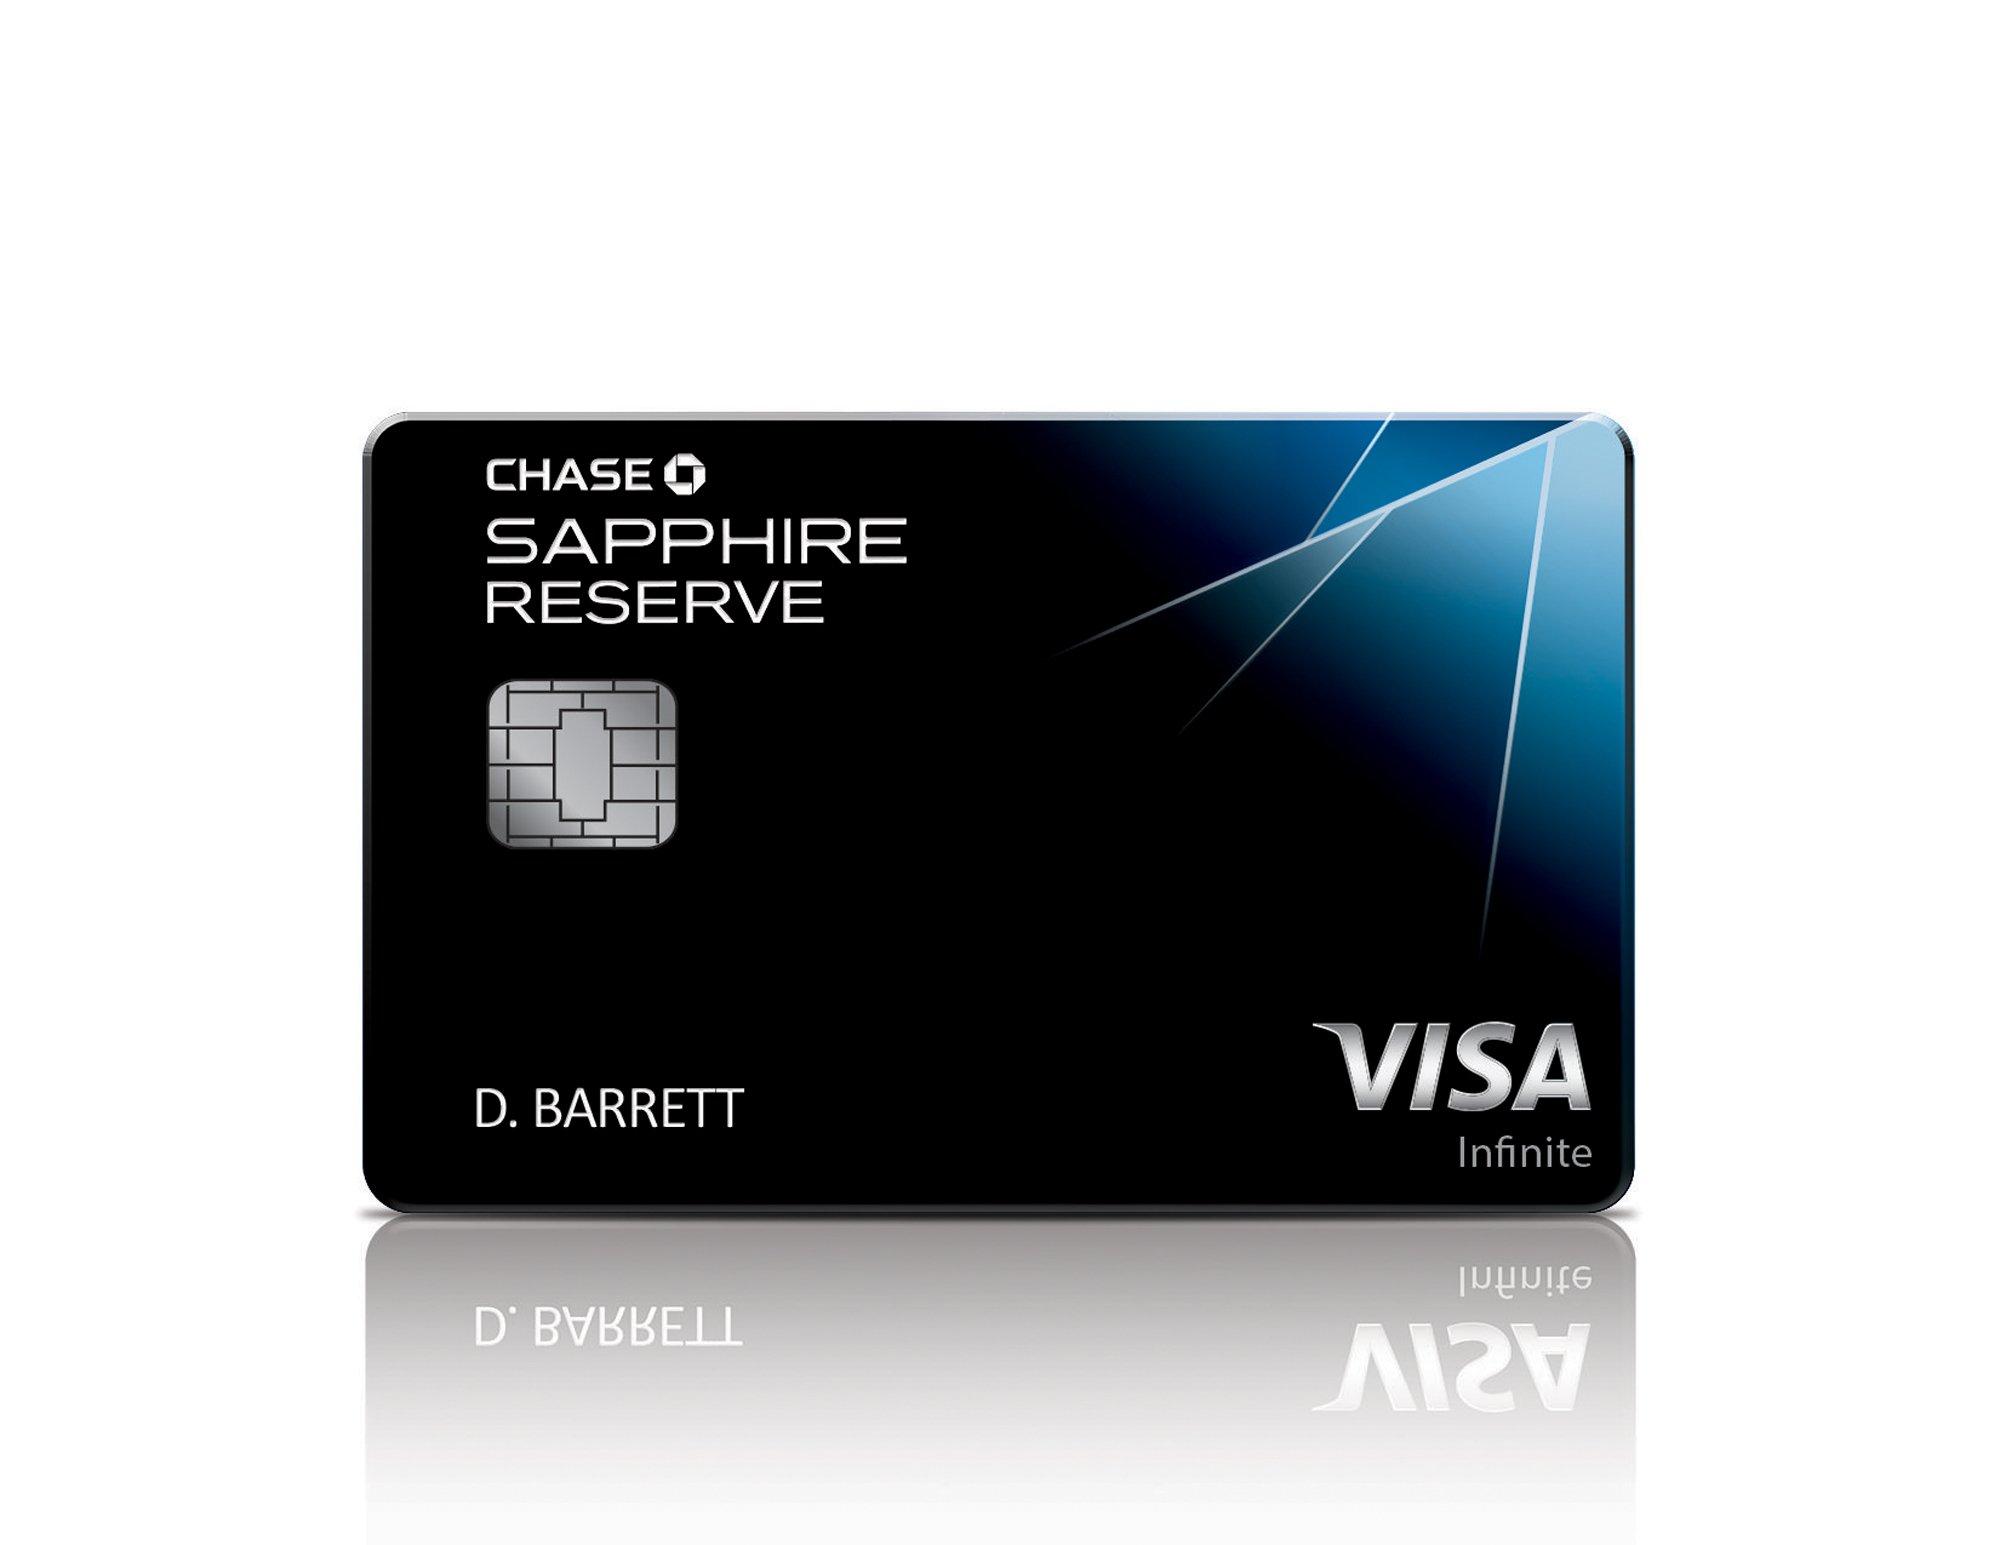 credit card sensation the hottest new plastic is metal - Plastic Credit Card